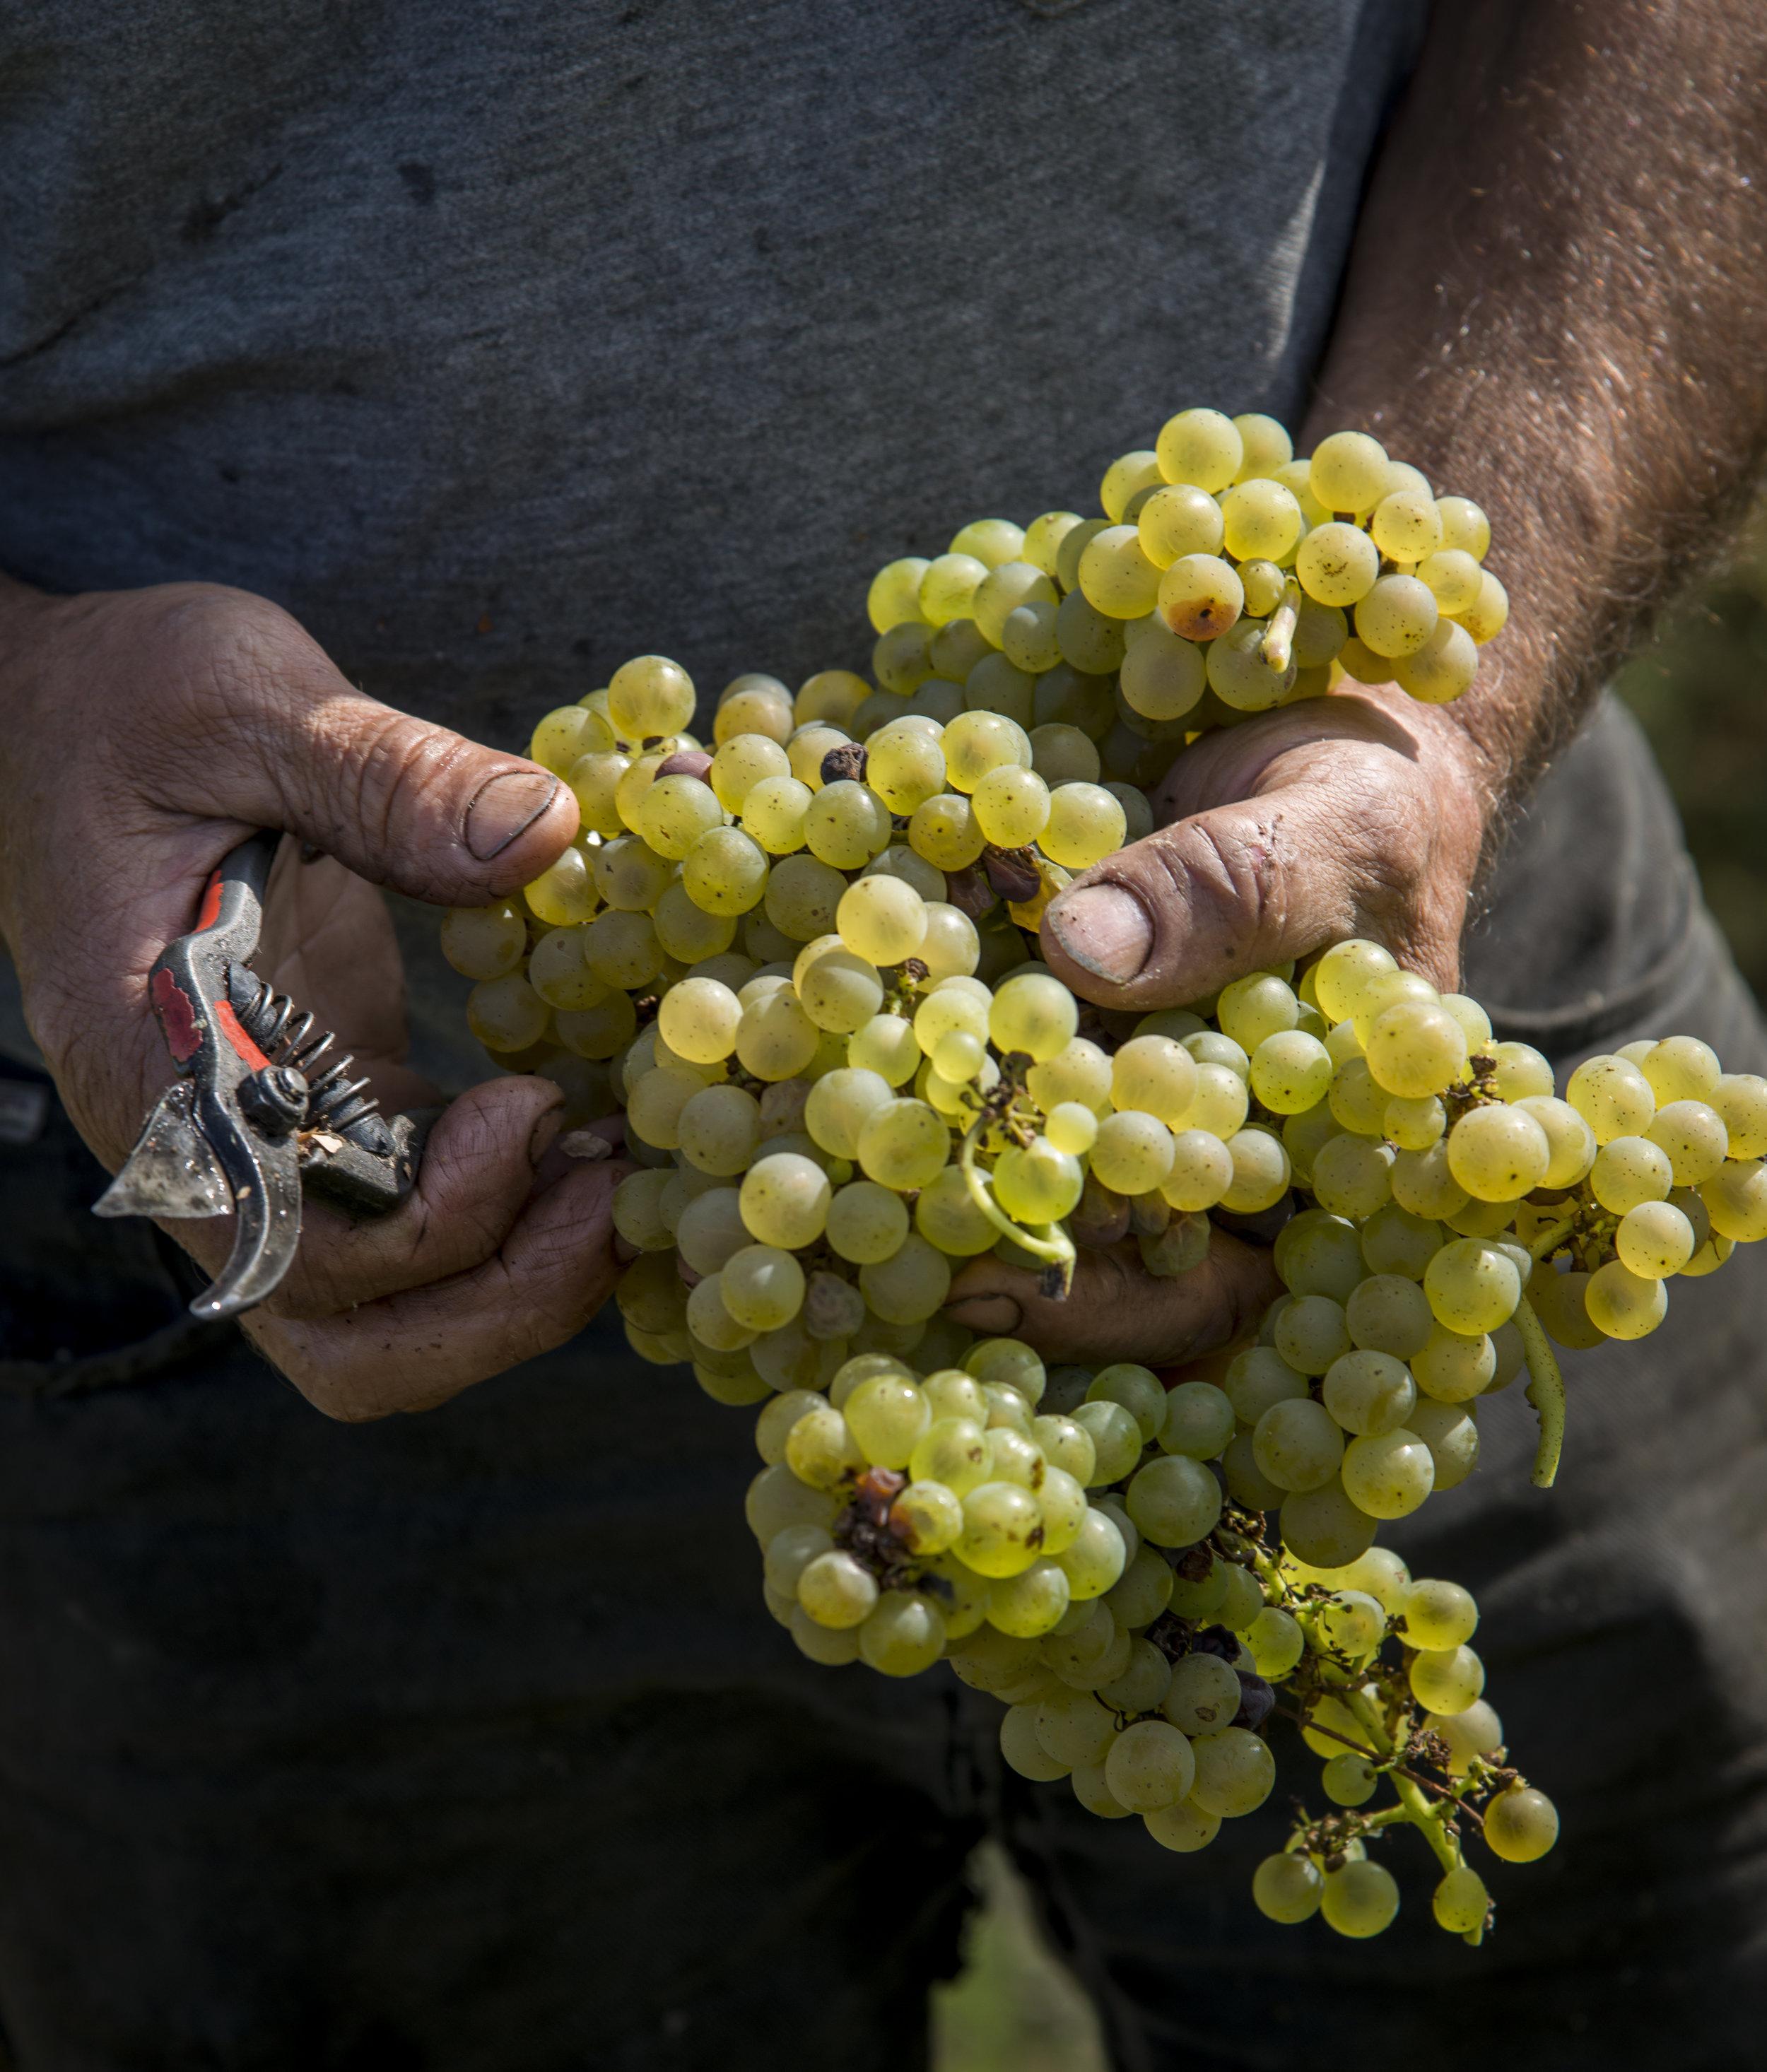 Hands holding Melon de Bourgogne grapes – close up    Photos (courtesy of Domaine Landron)